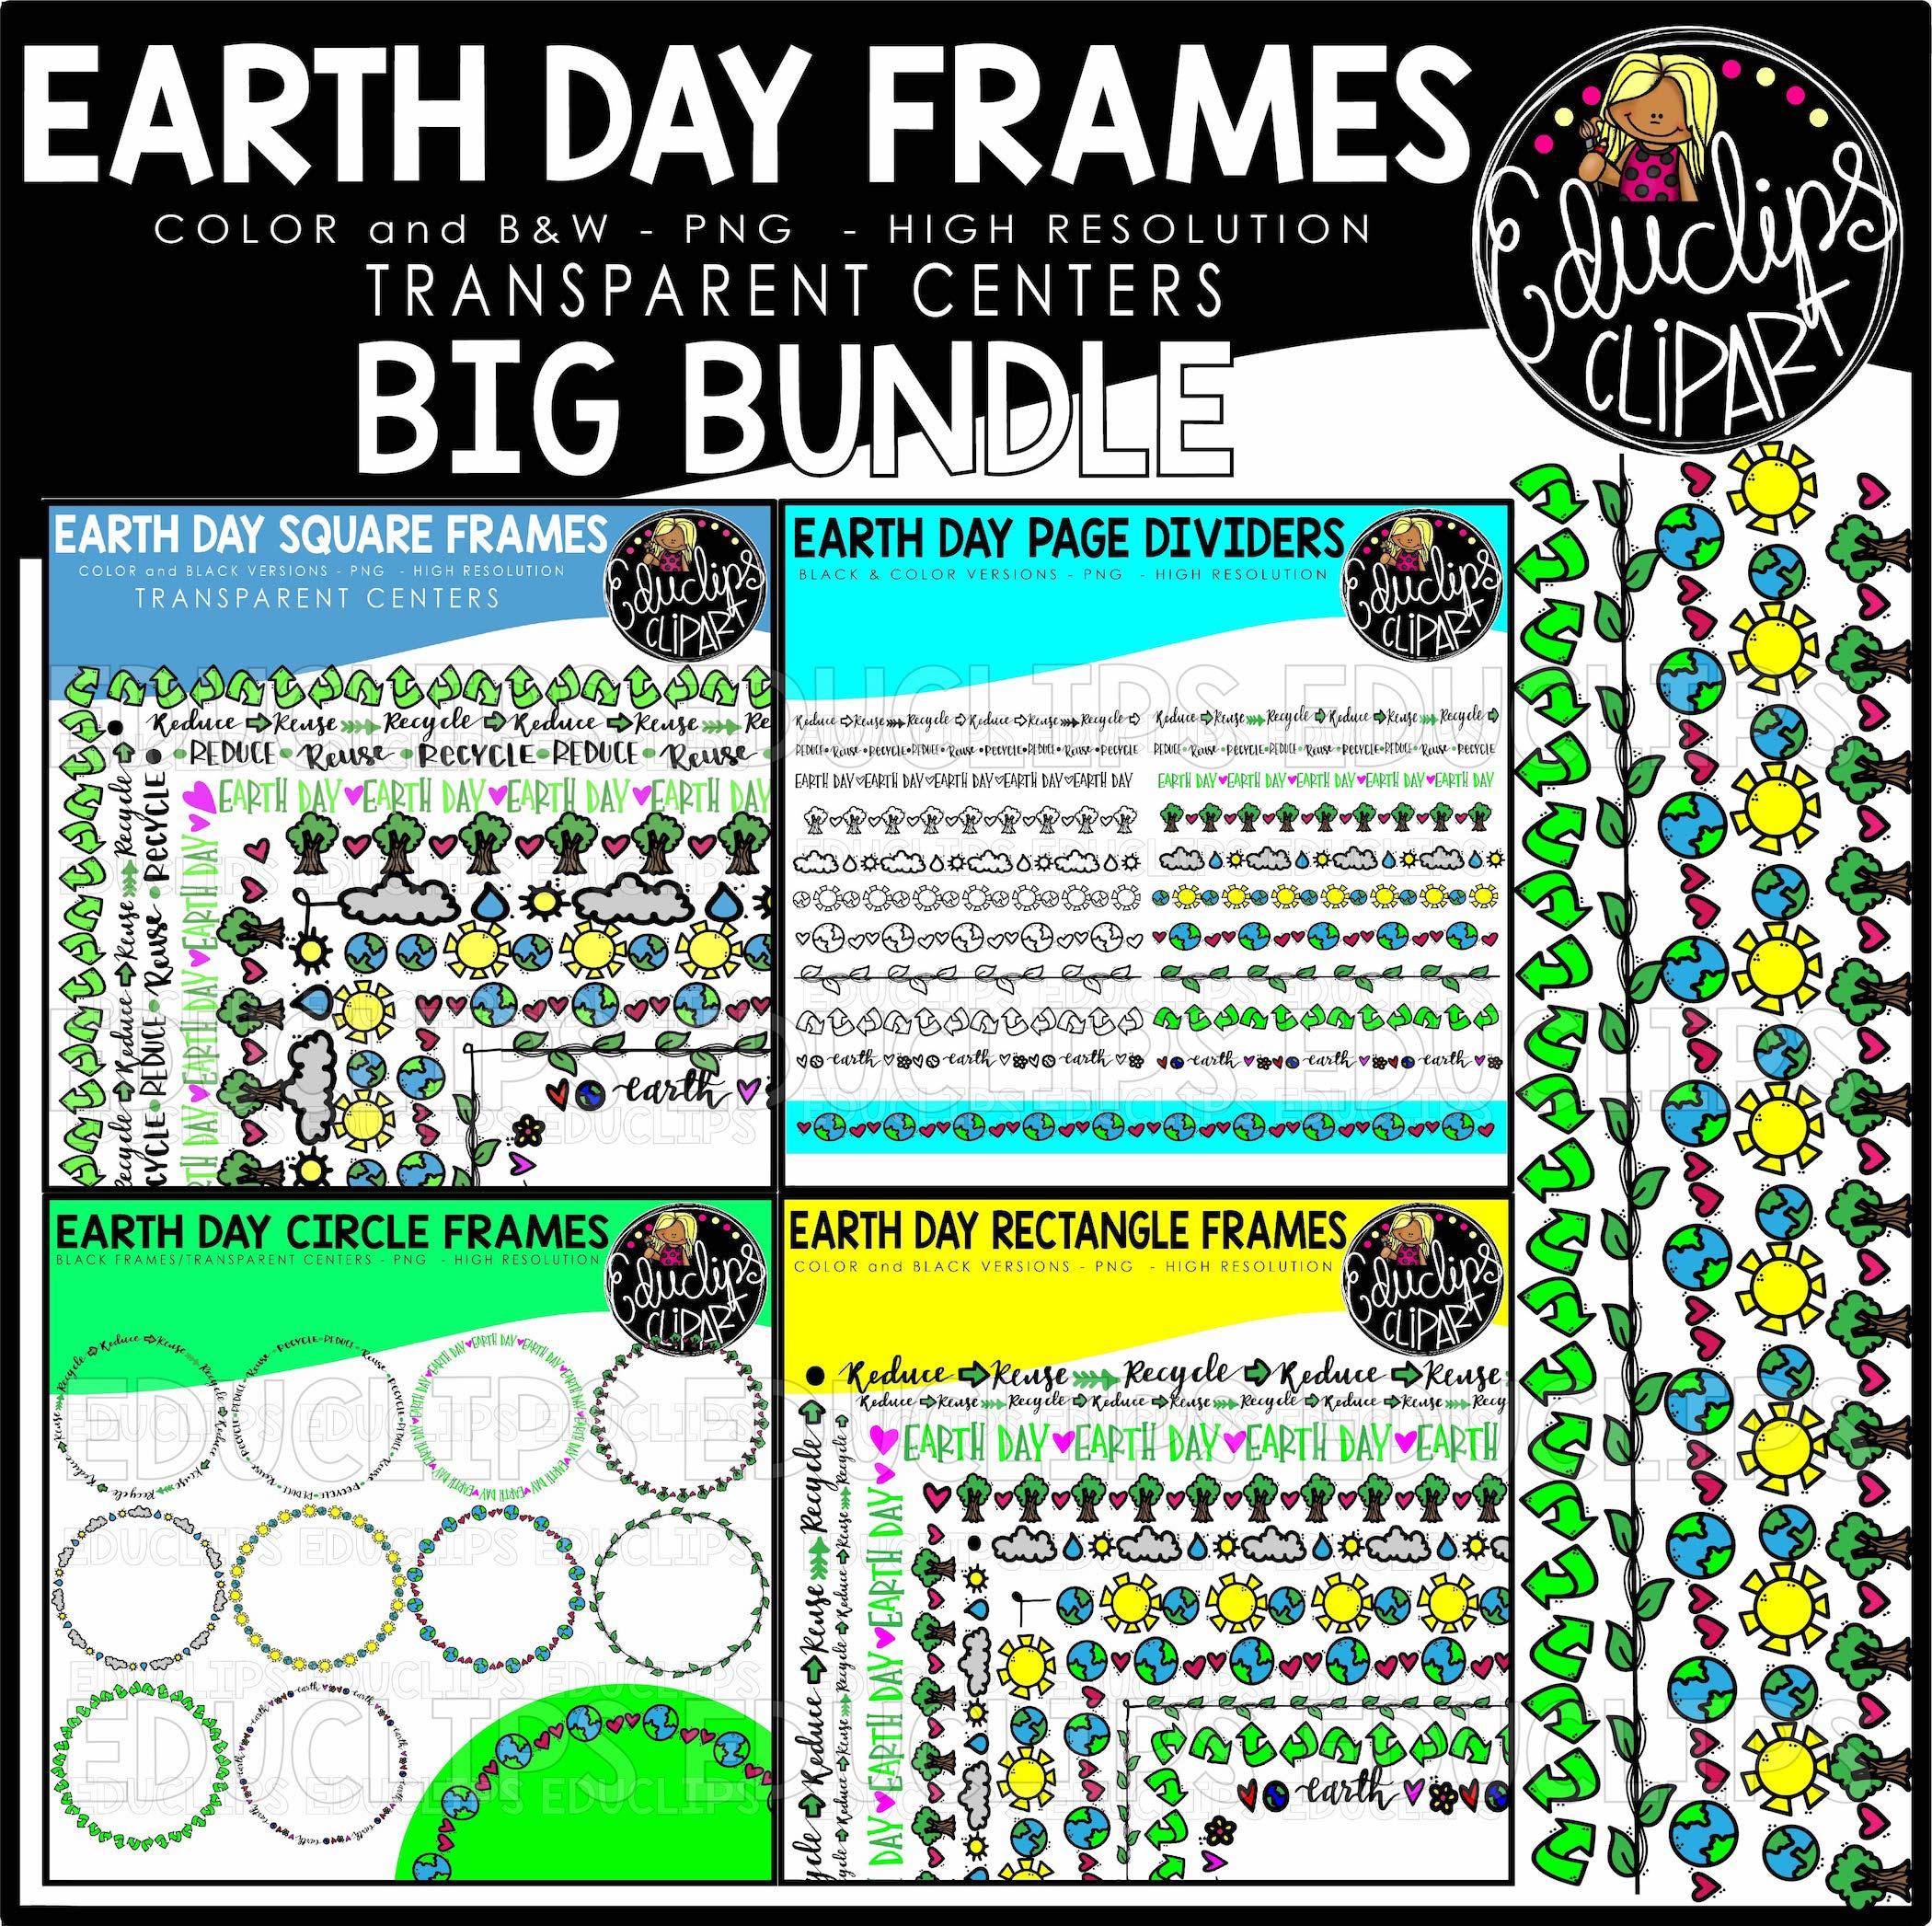 Earth Day Frames Big Bundle Black Amp Color Welcome To